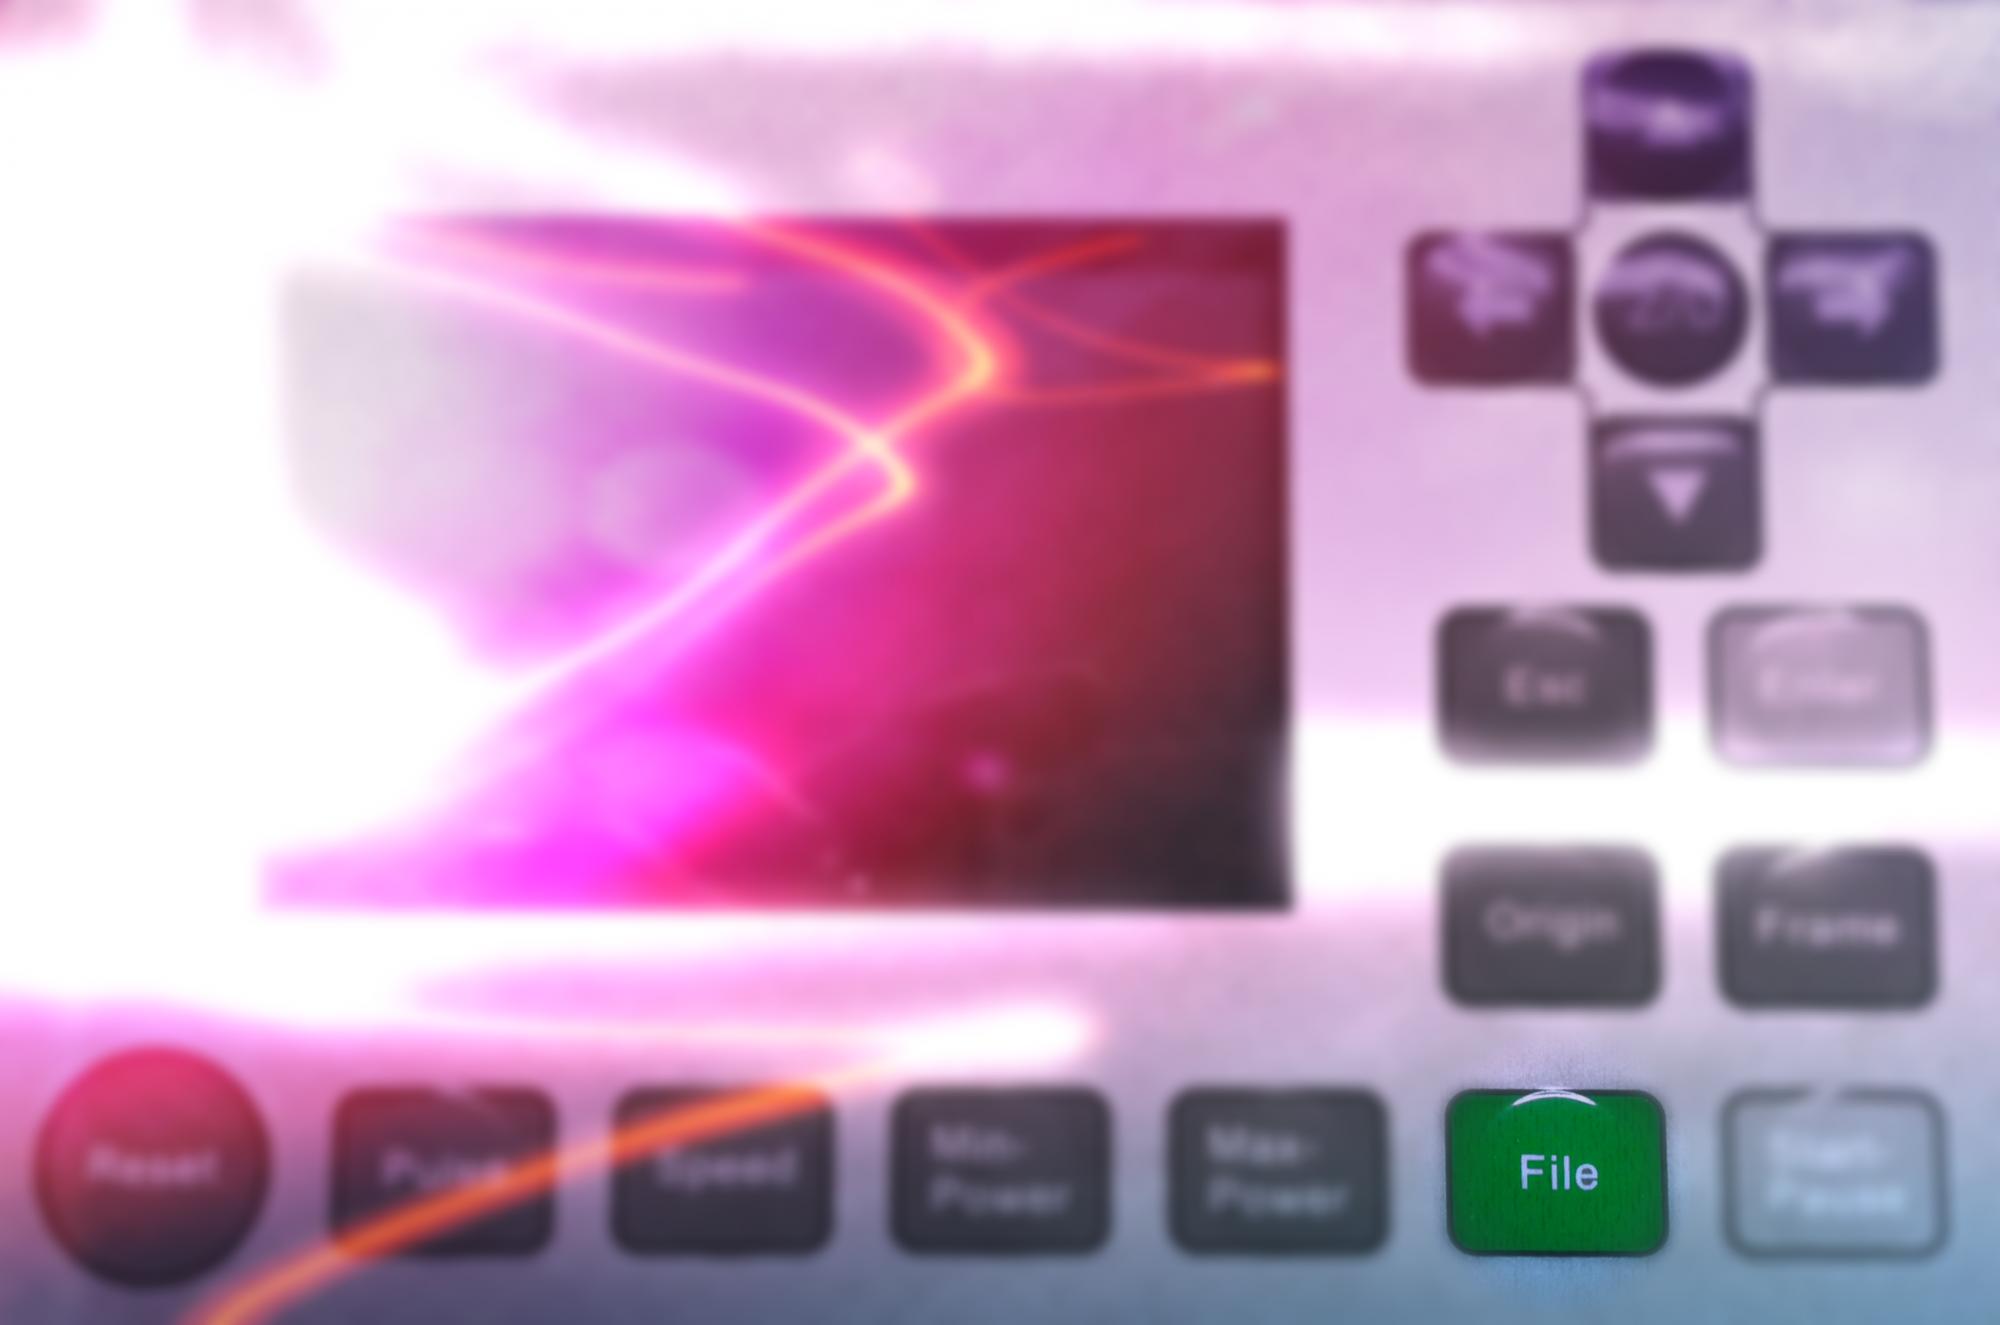 SMII Laser Pants - Unofficial RuiDa Hack